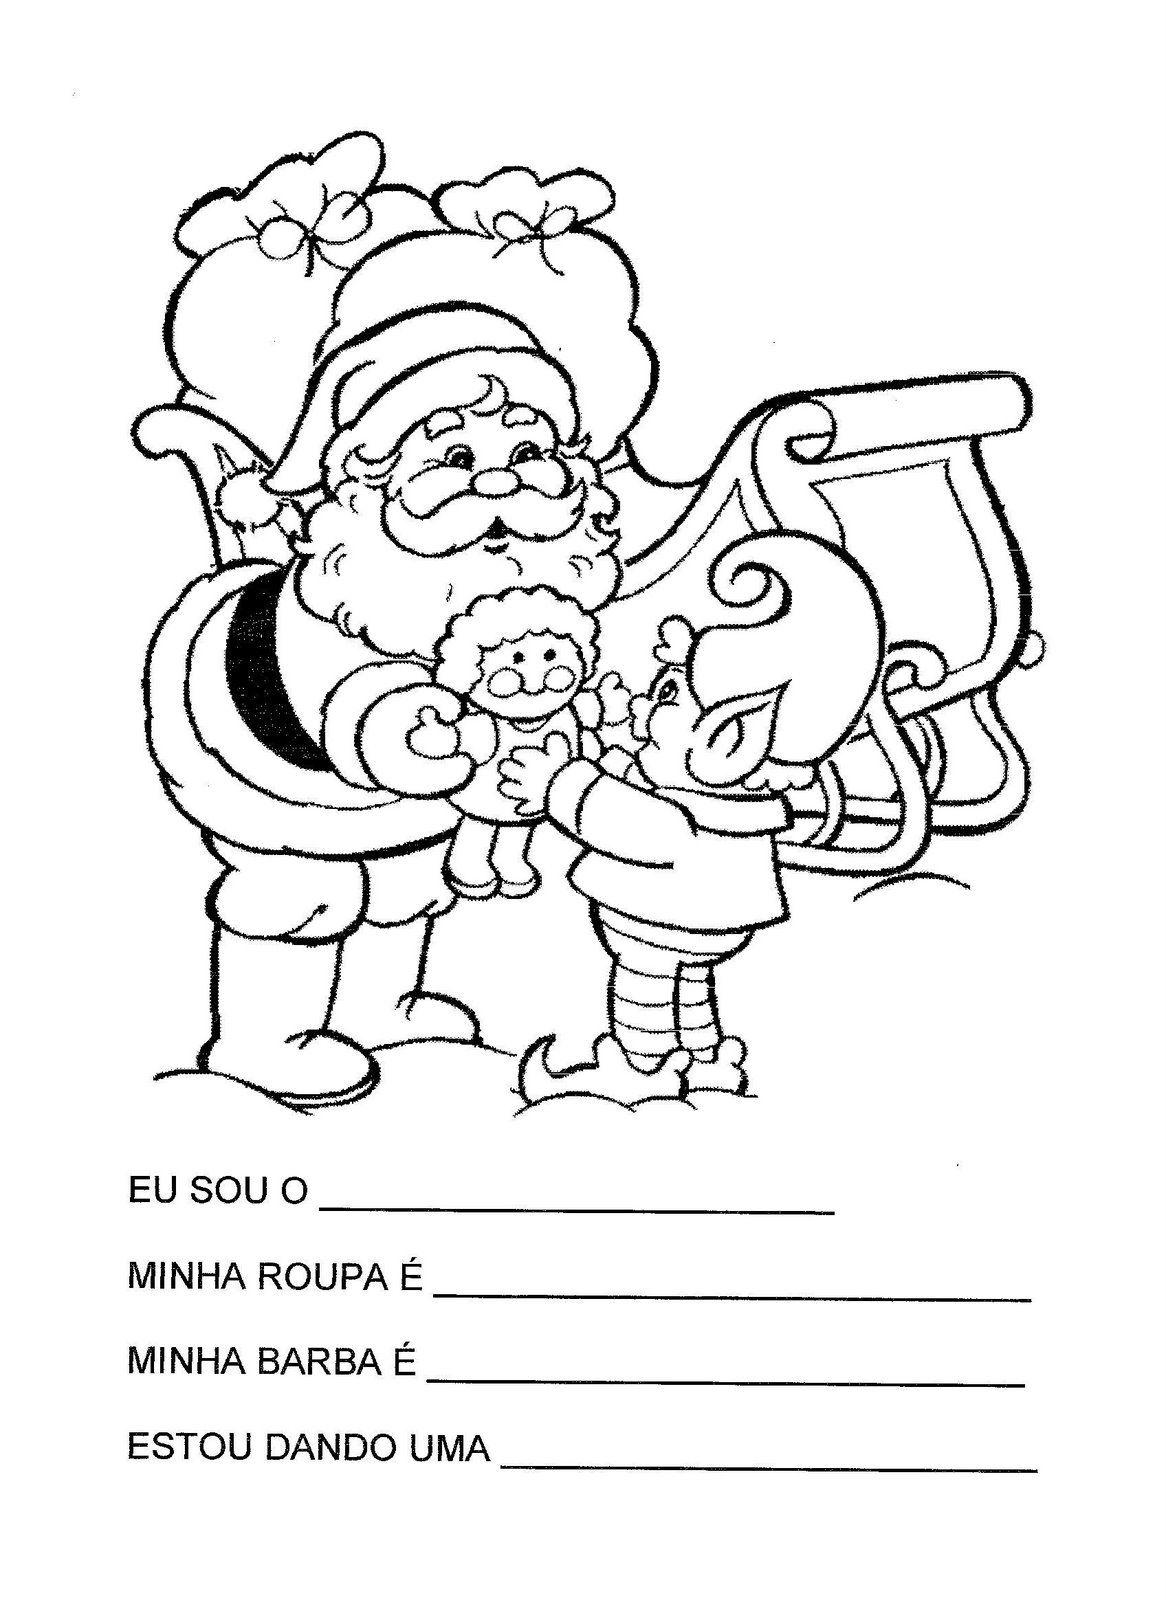 Atividades Educativas de Natal 999 | atividades escolares | Pinterest